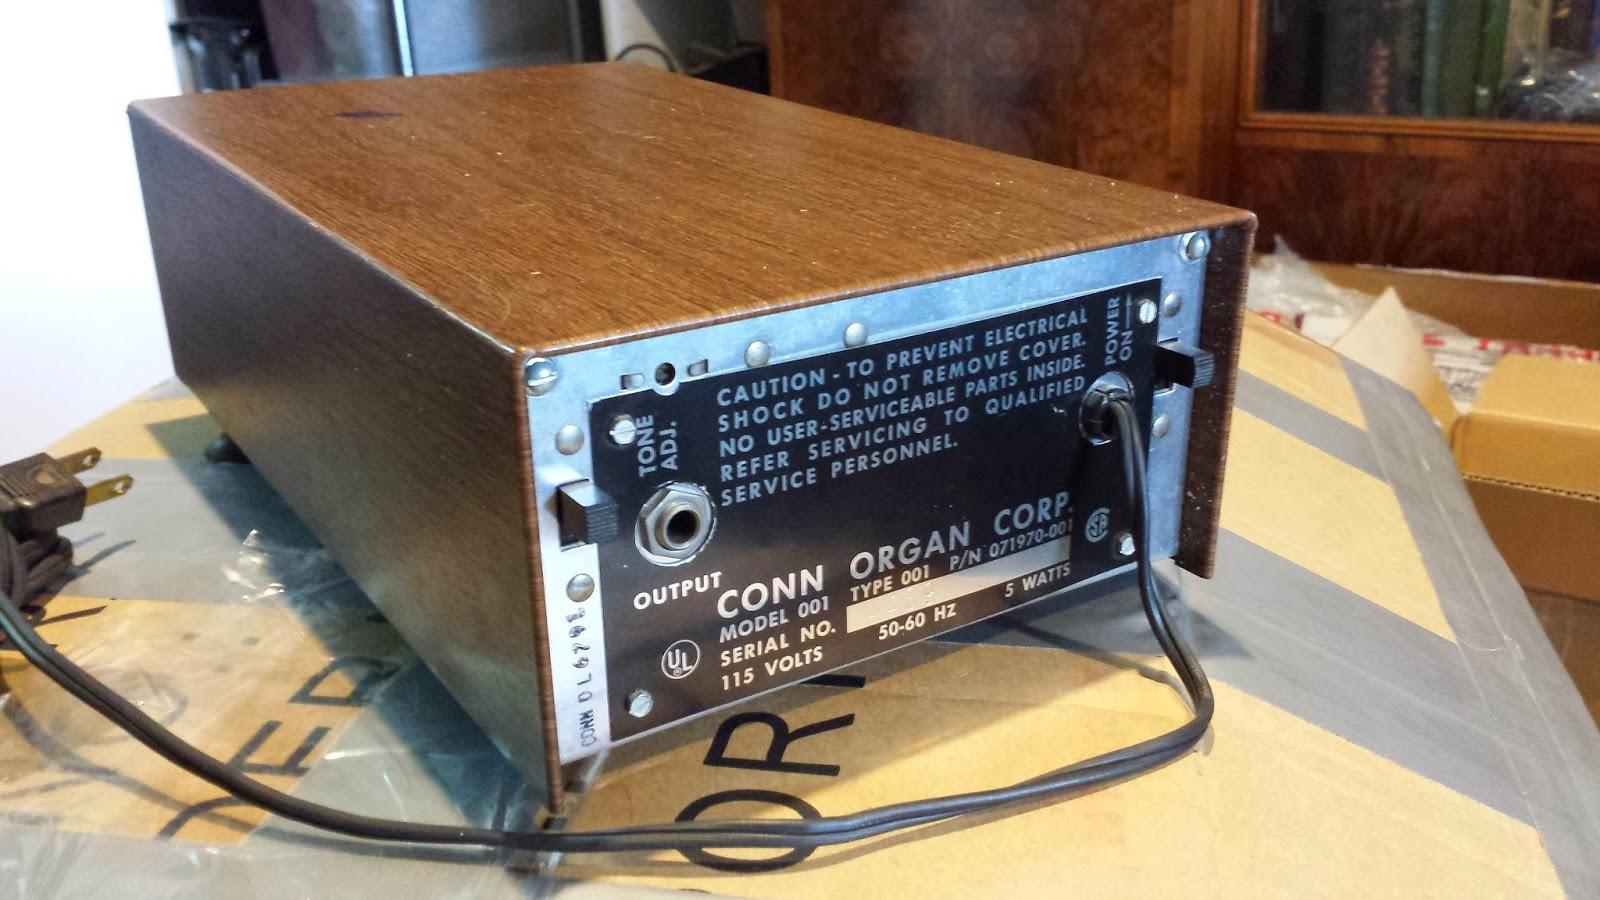 JonDent - Exploring Electronic Music: Conn Min-o-matic Rhythm Drum